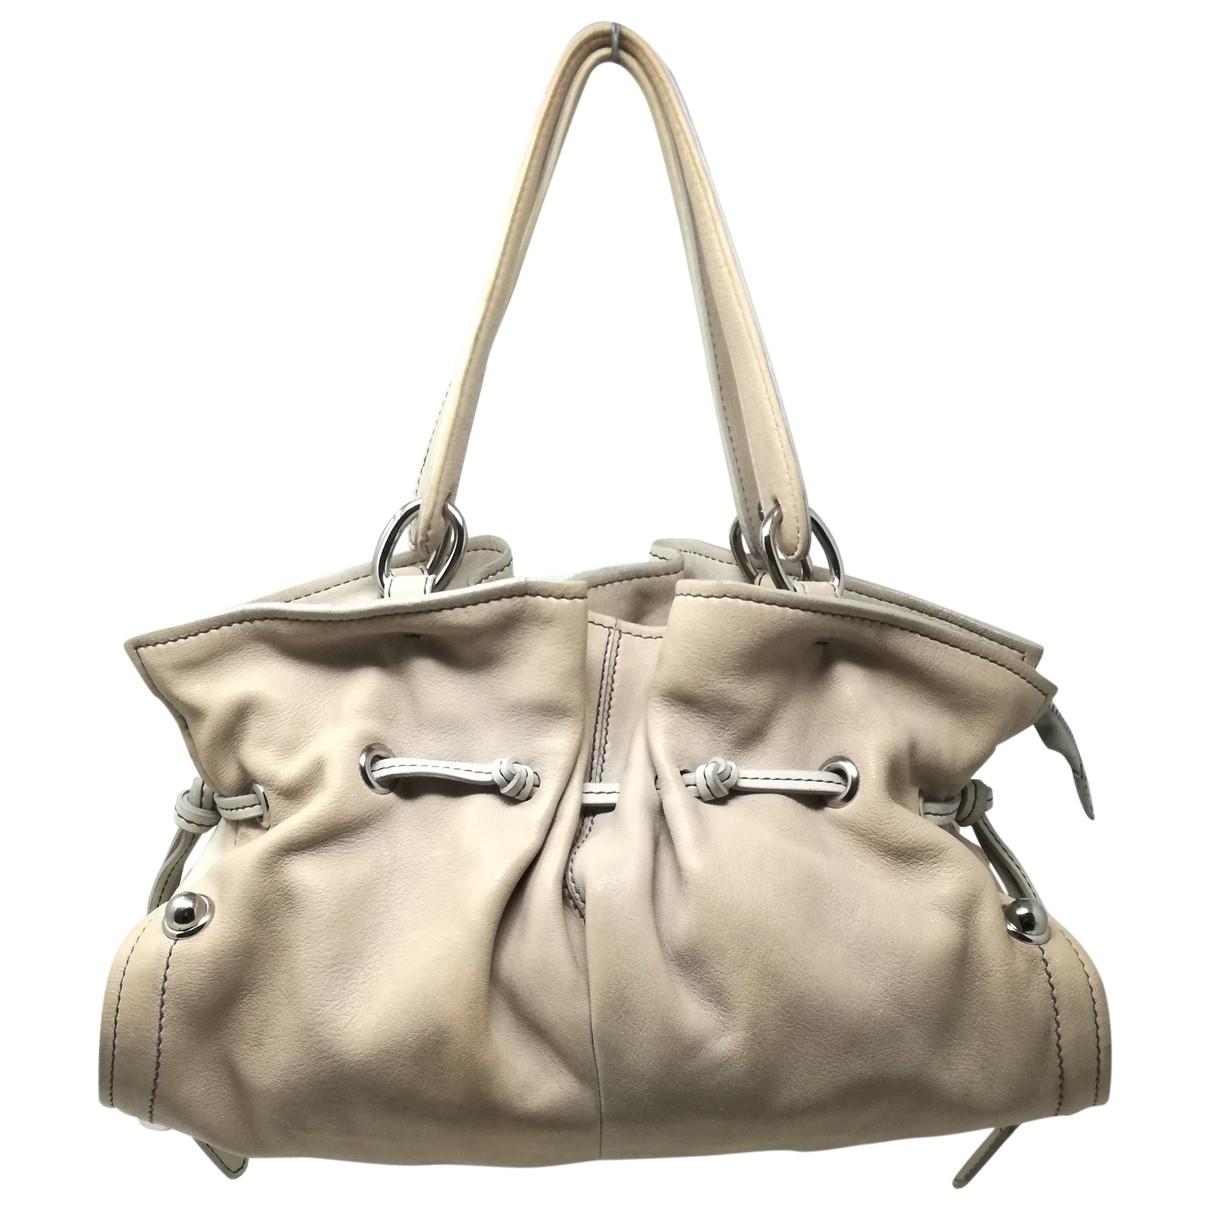 Coccinelle \N Beige Leather handbag for Women \N